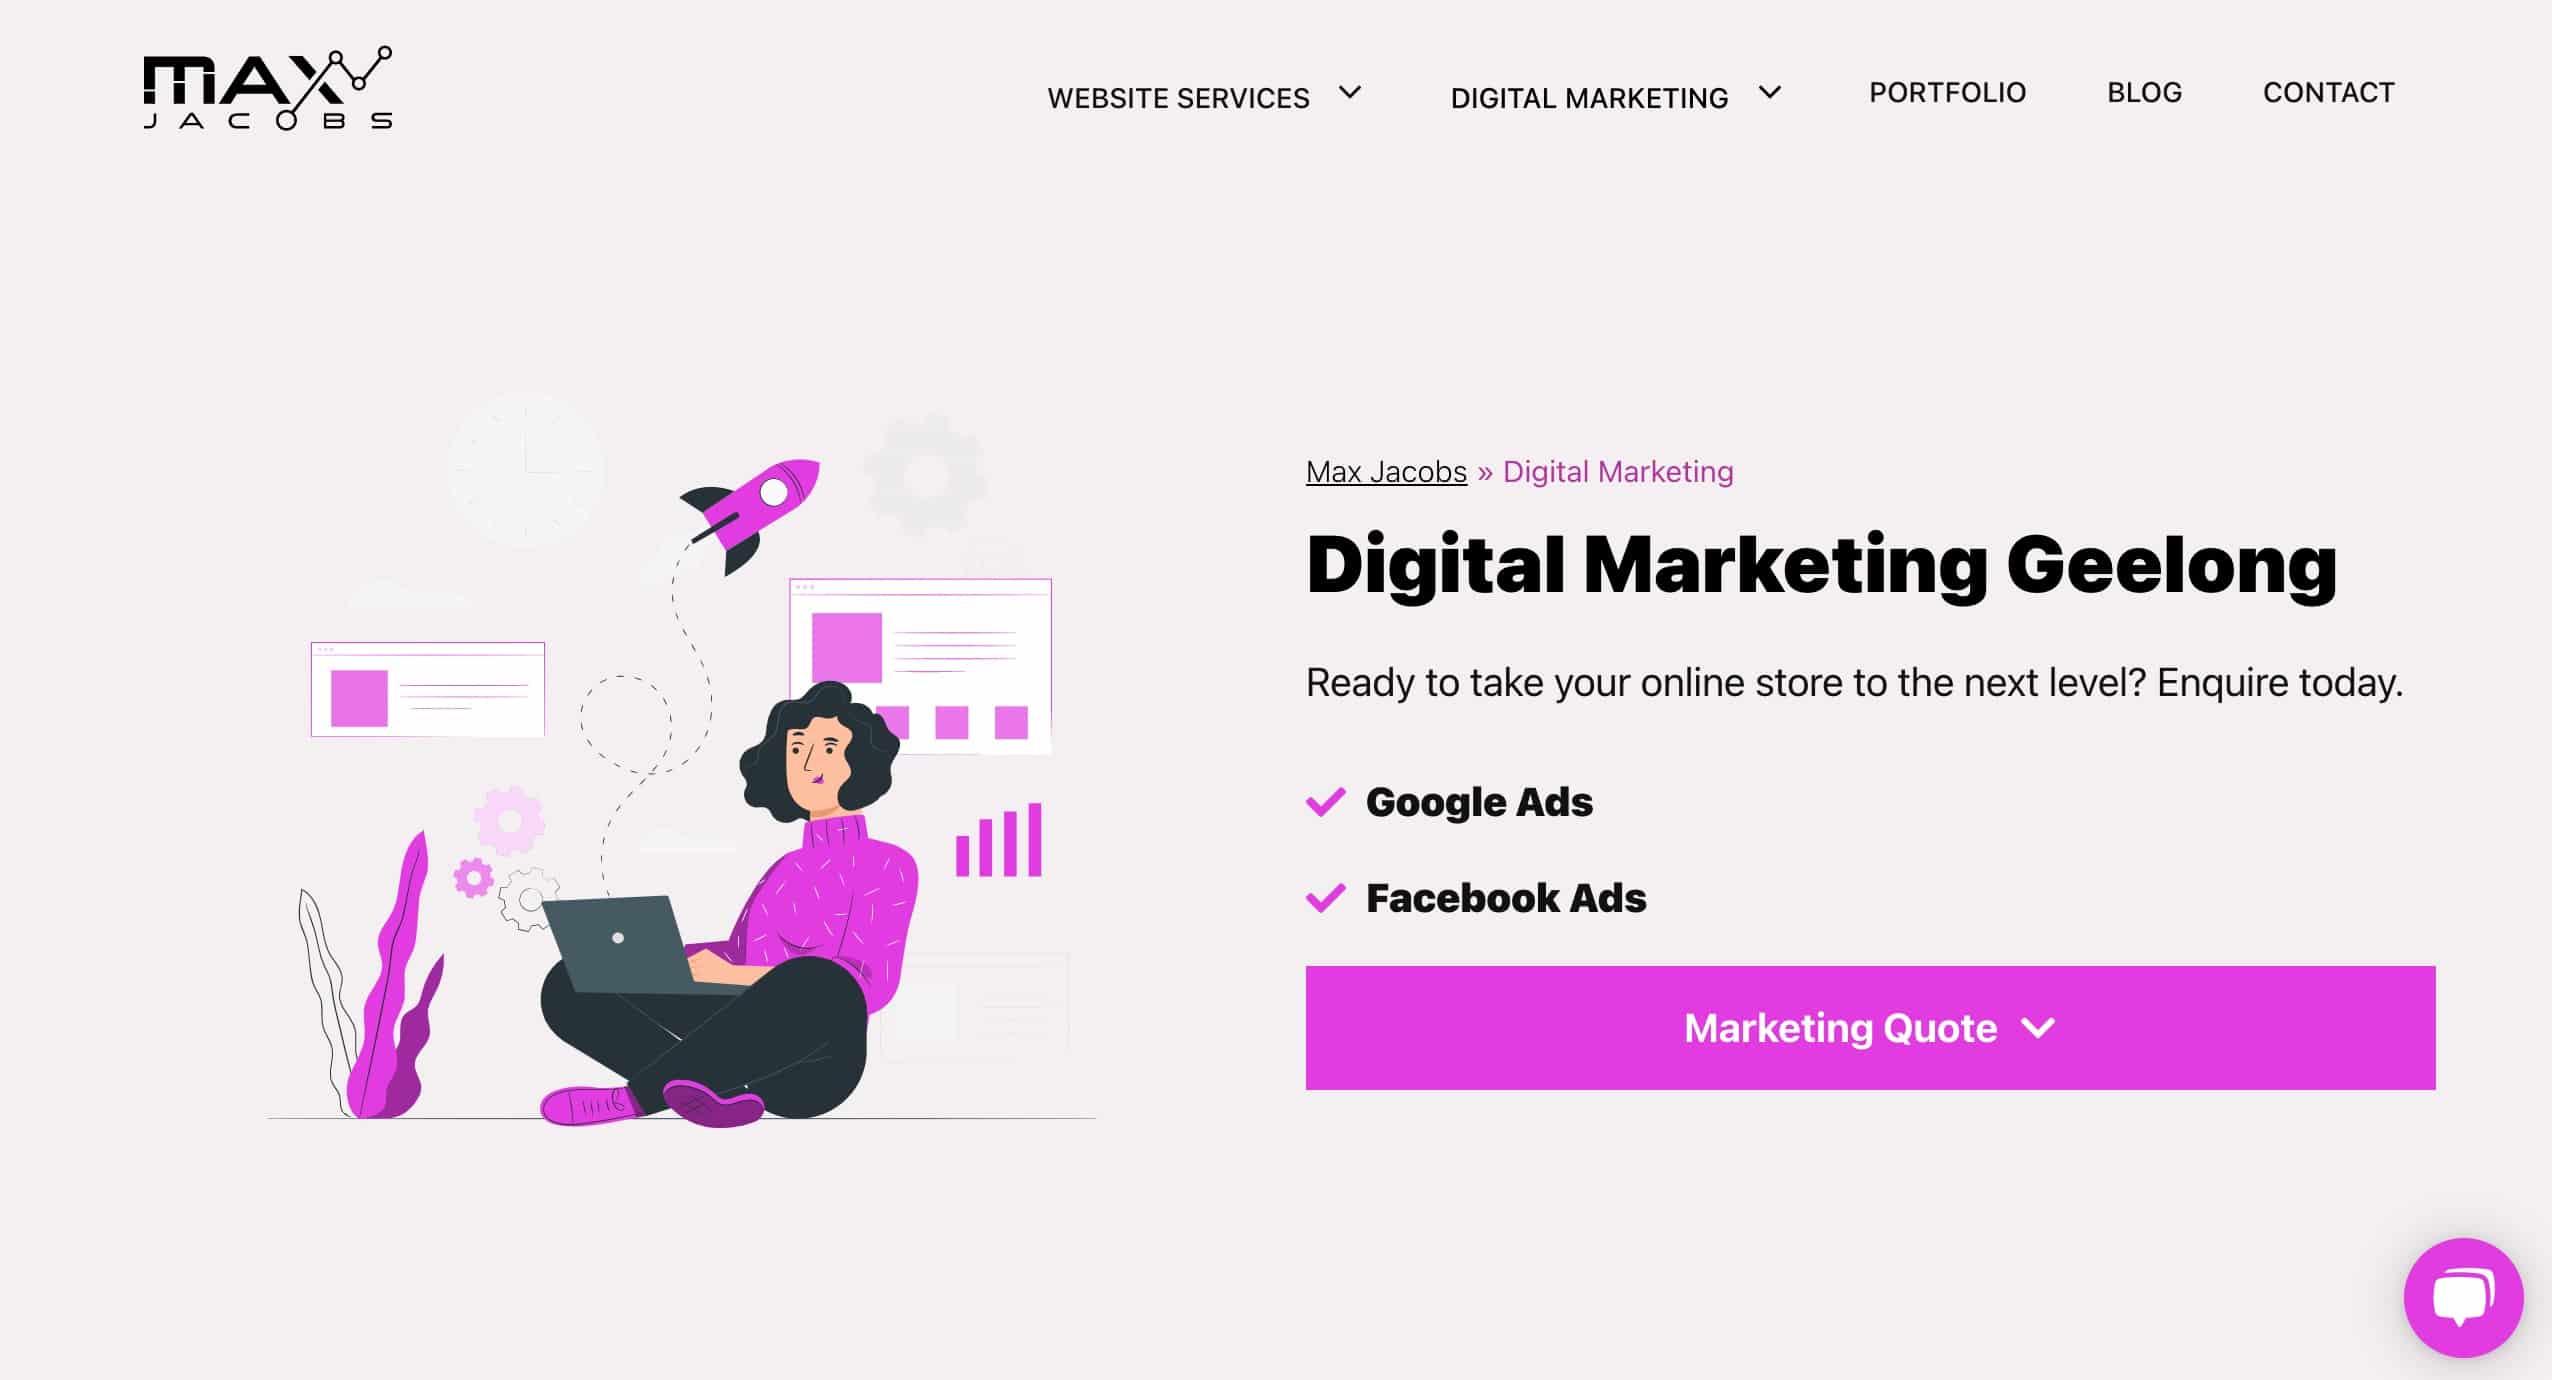 Digital Marketing Geelong